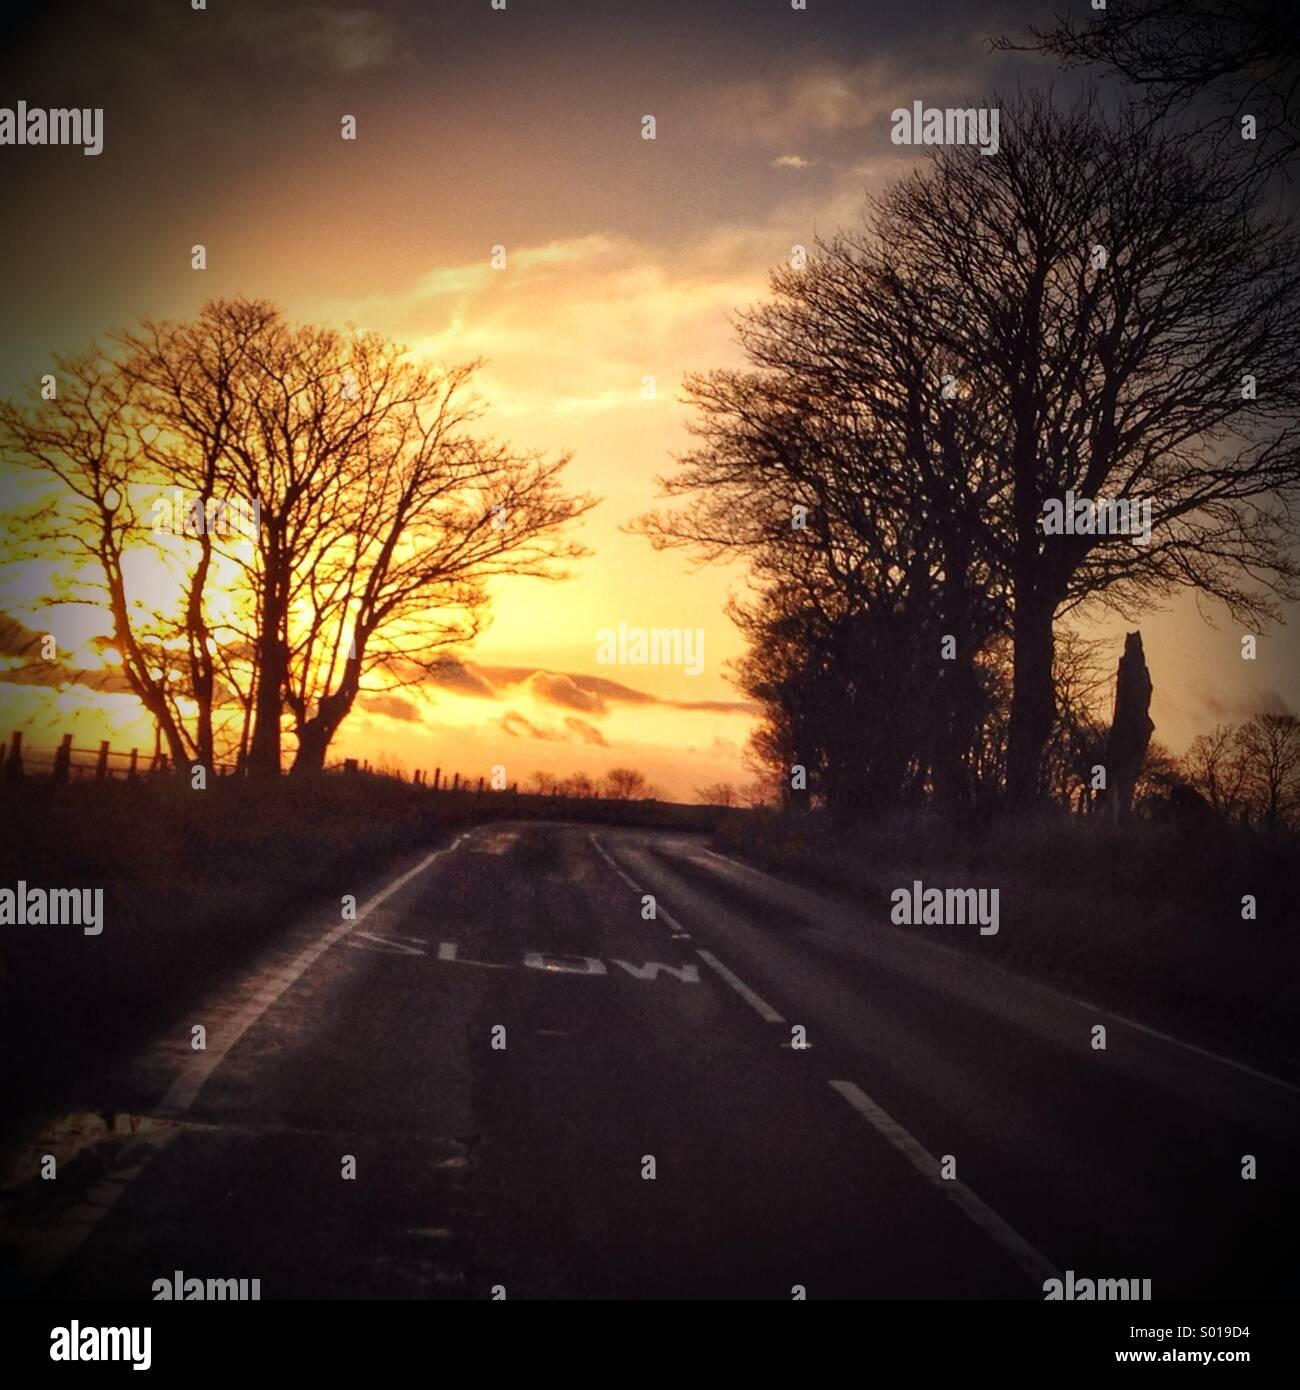 Slow Road. - Stock Image